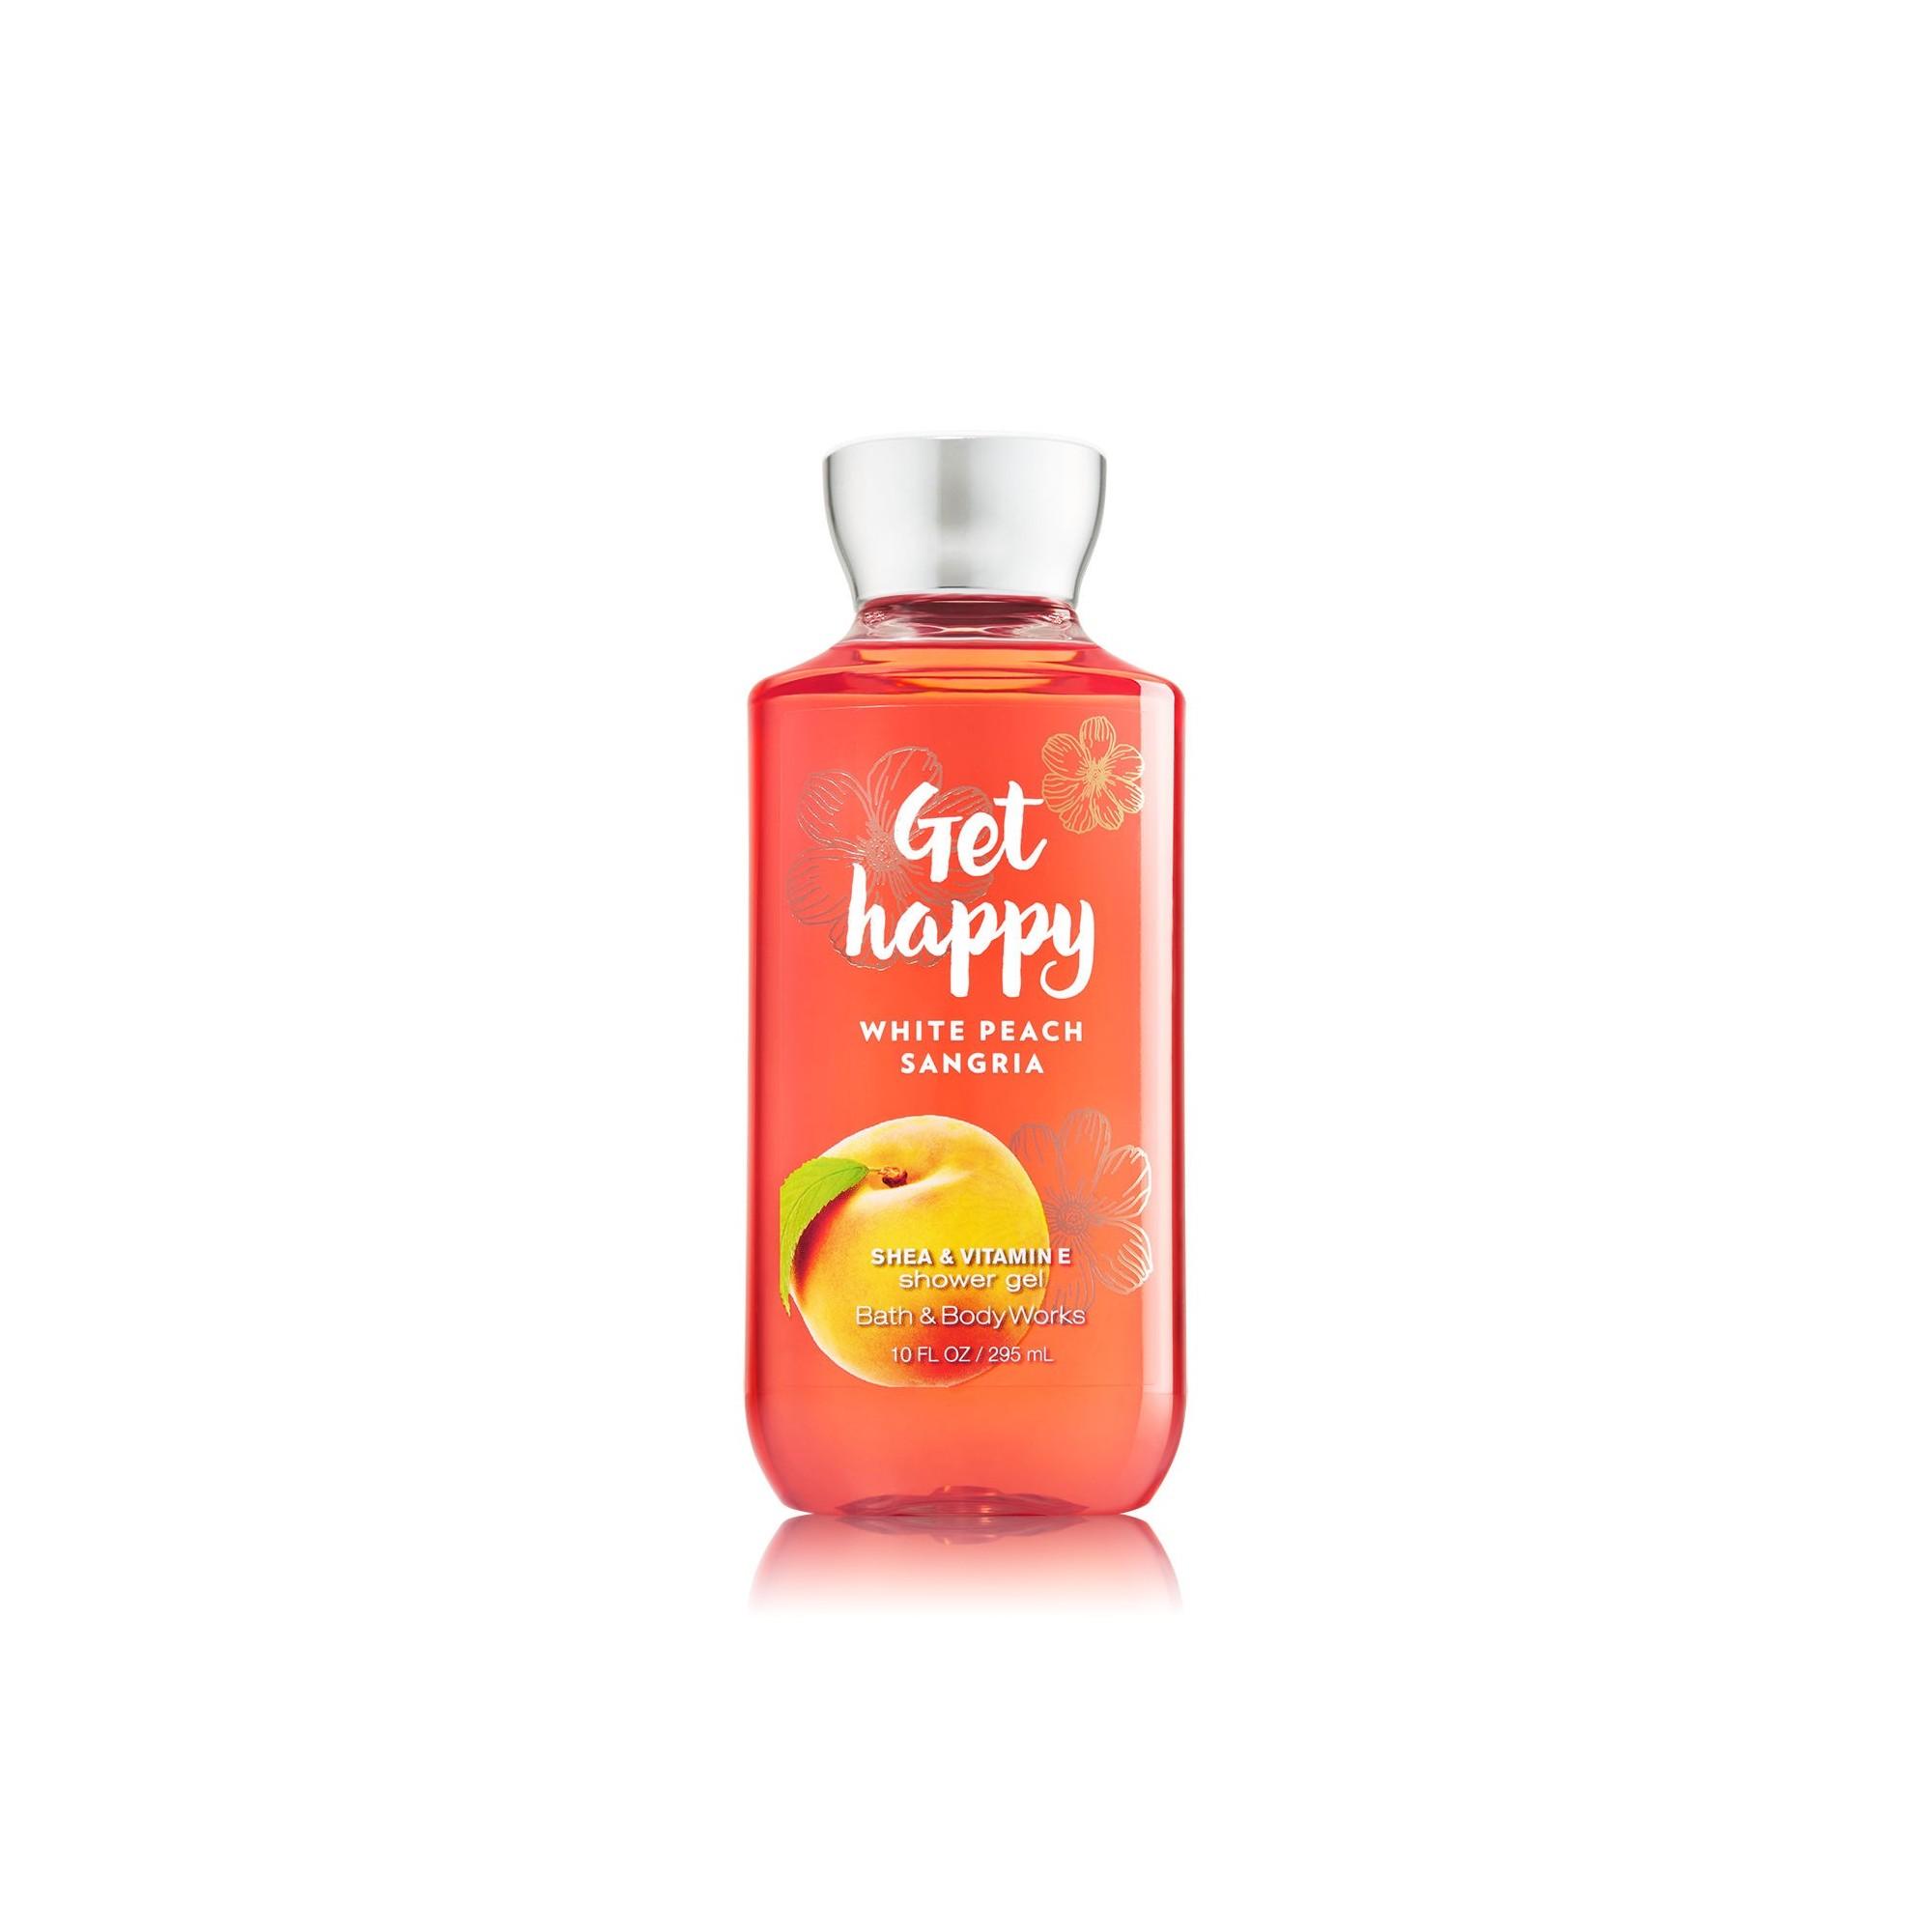 Bath & Body Works White Peach Sangria Shower Gel